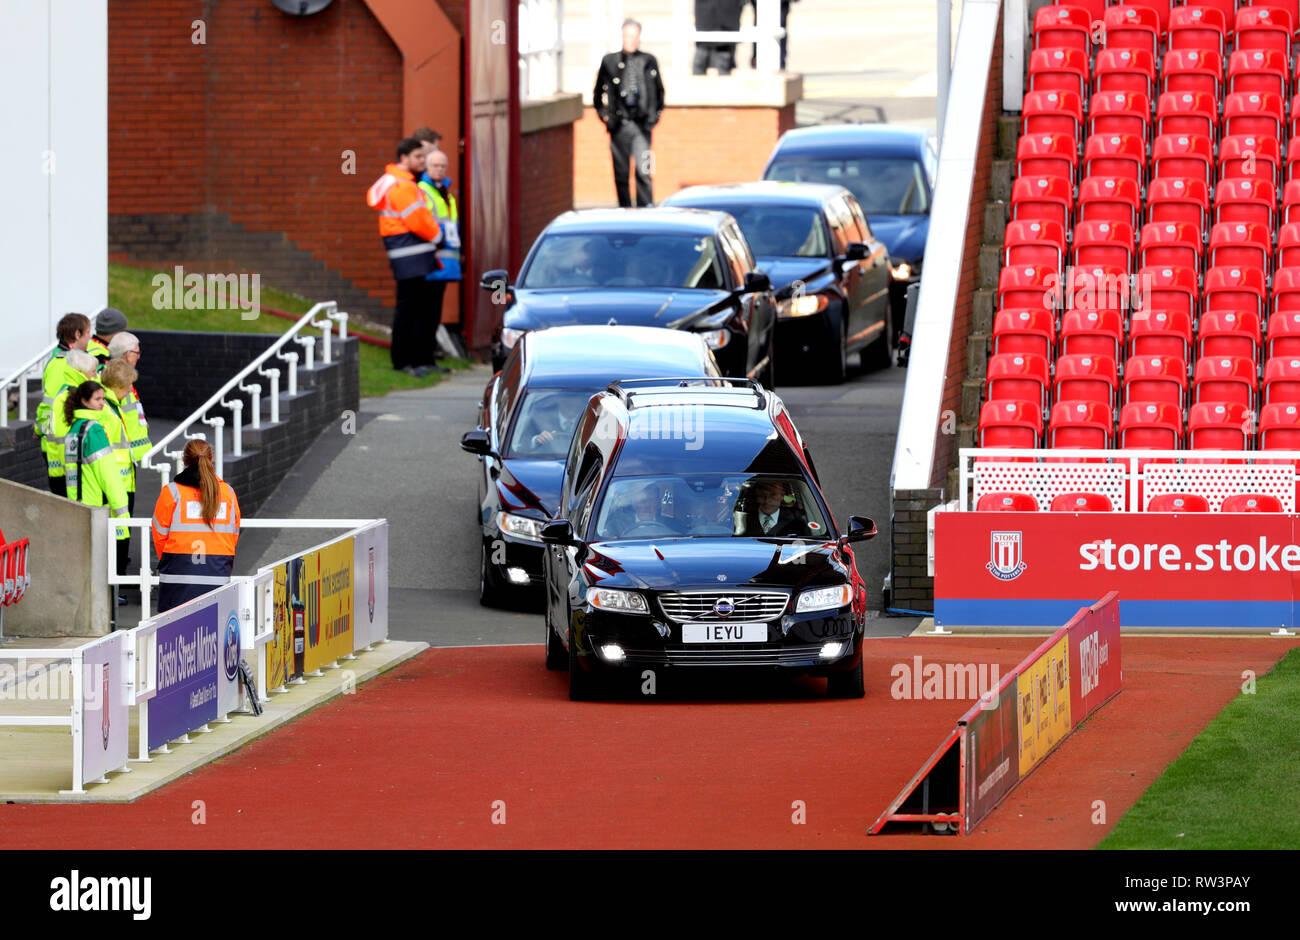 Gordon Banks funeral cortege arrives at the bet365 Stadium, Stoke. Stock Photo